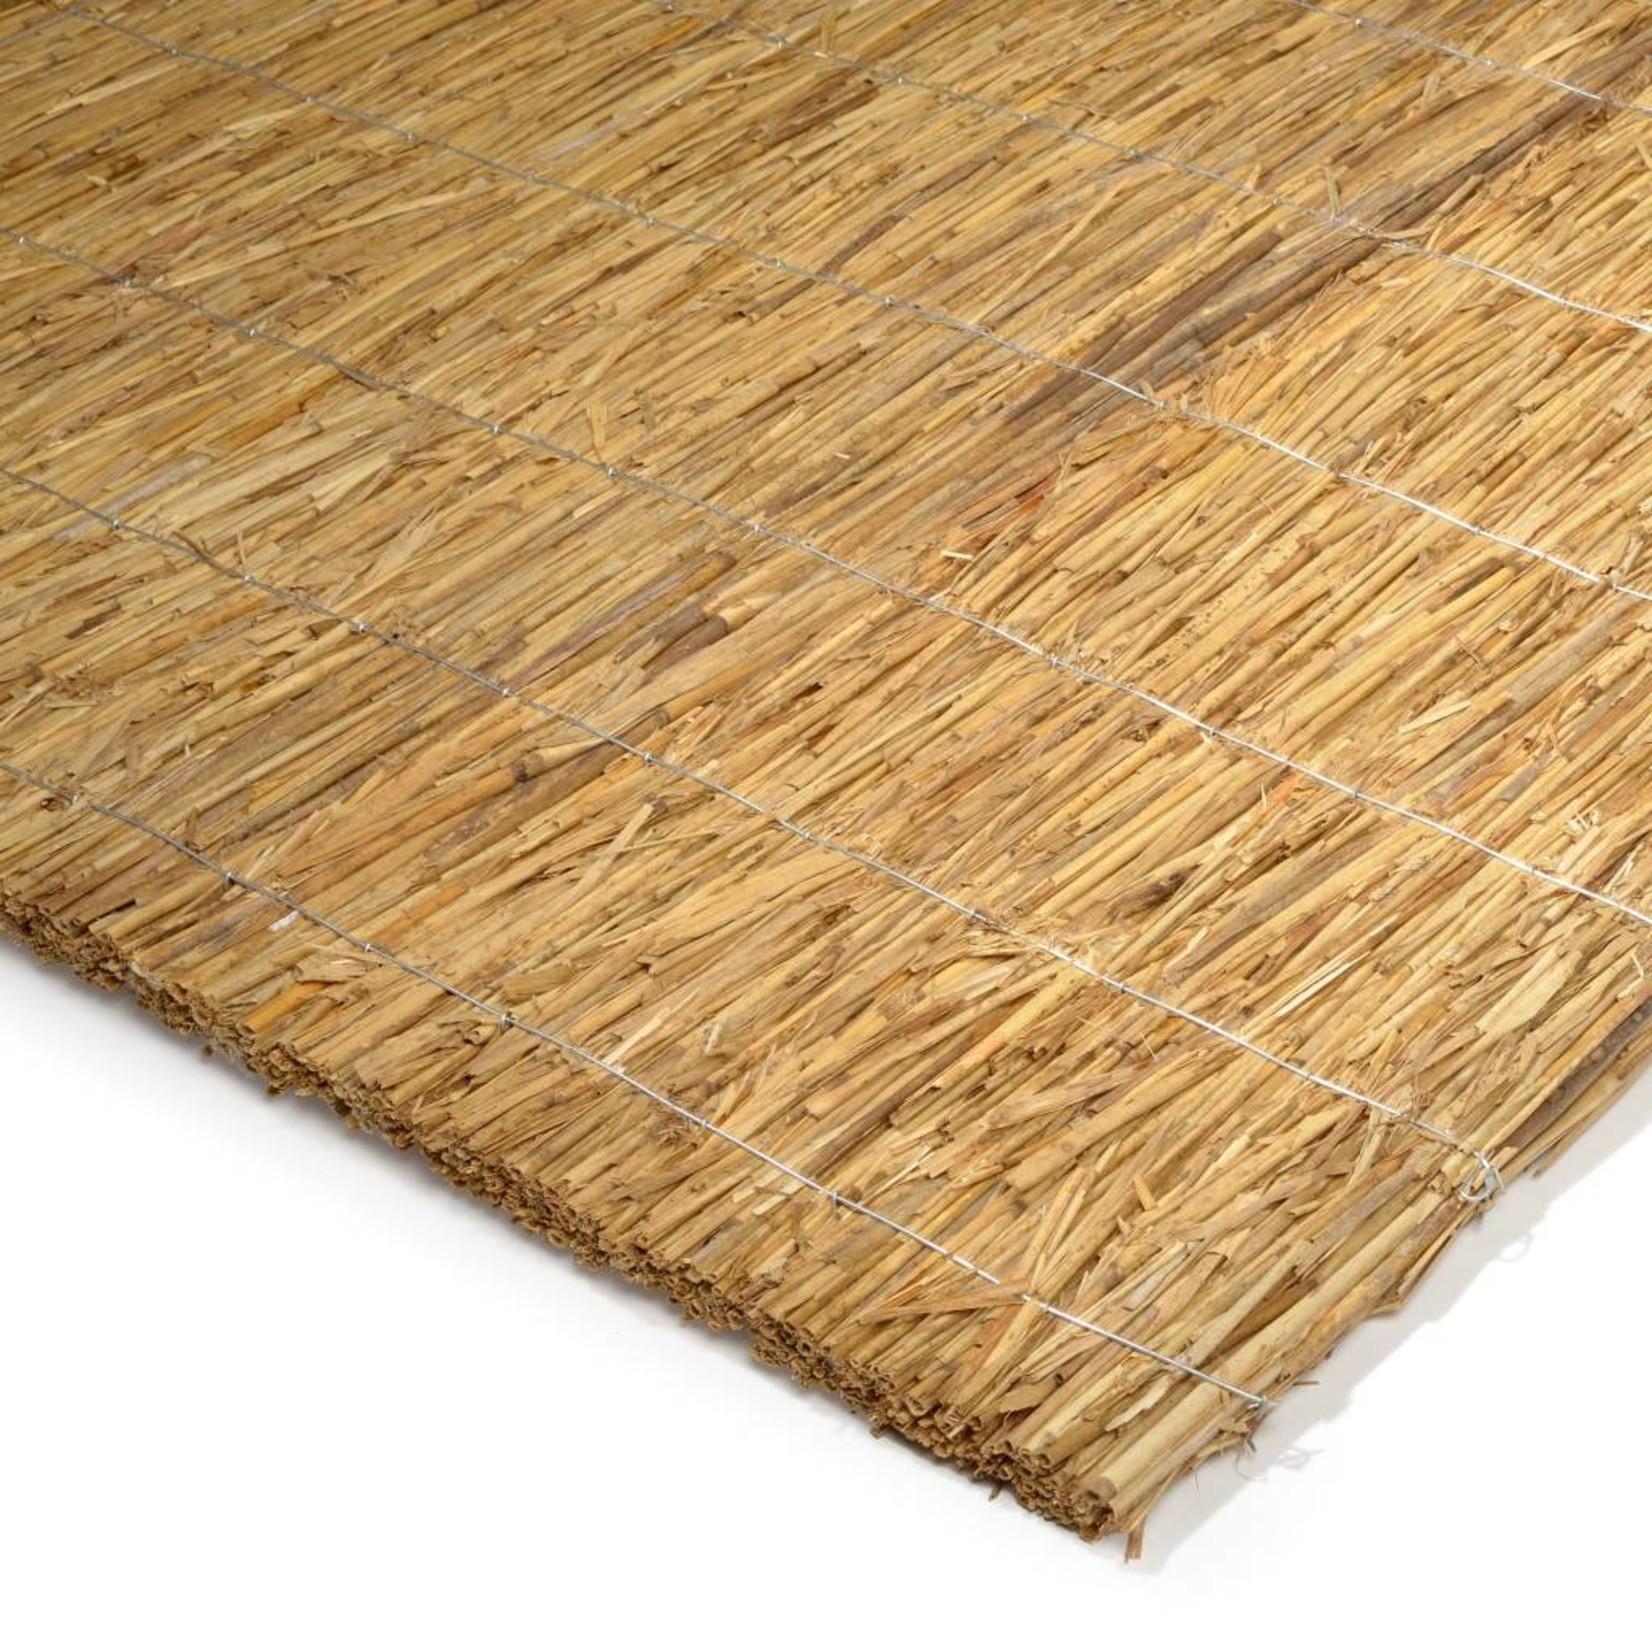 TuinChamp Rietplaat 3 cm dik 200 x 200 cm